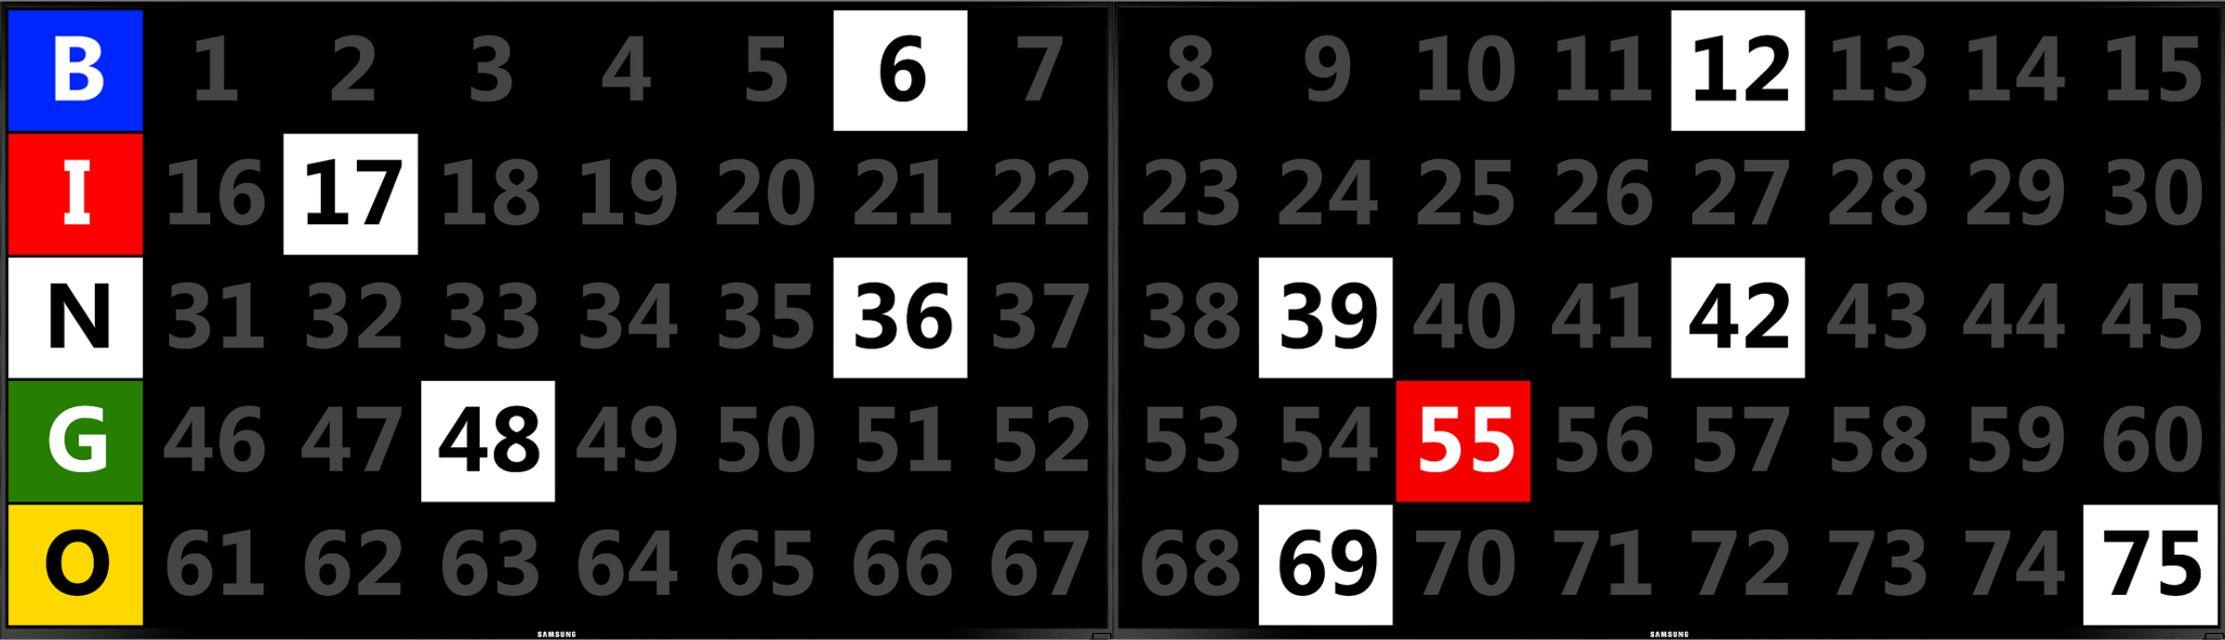 double screen BINGO EQUIPMENT/Flashboards